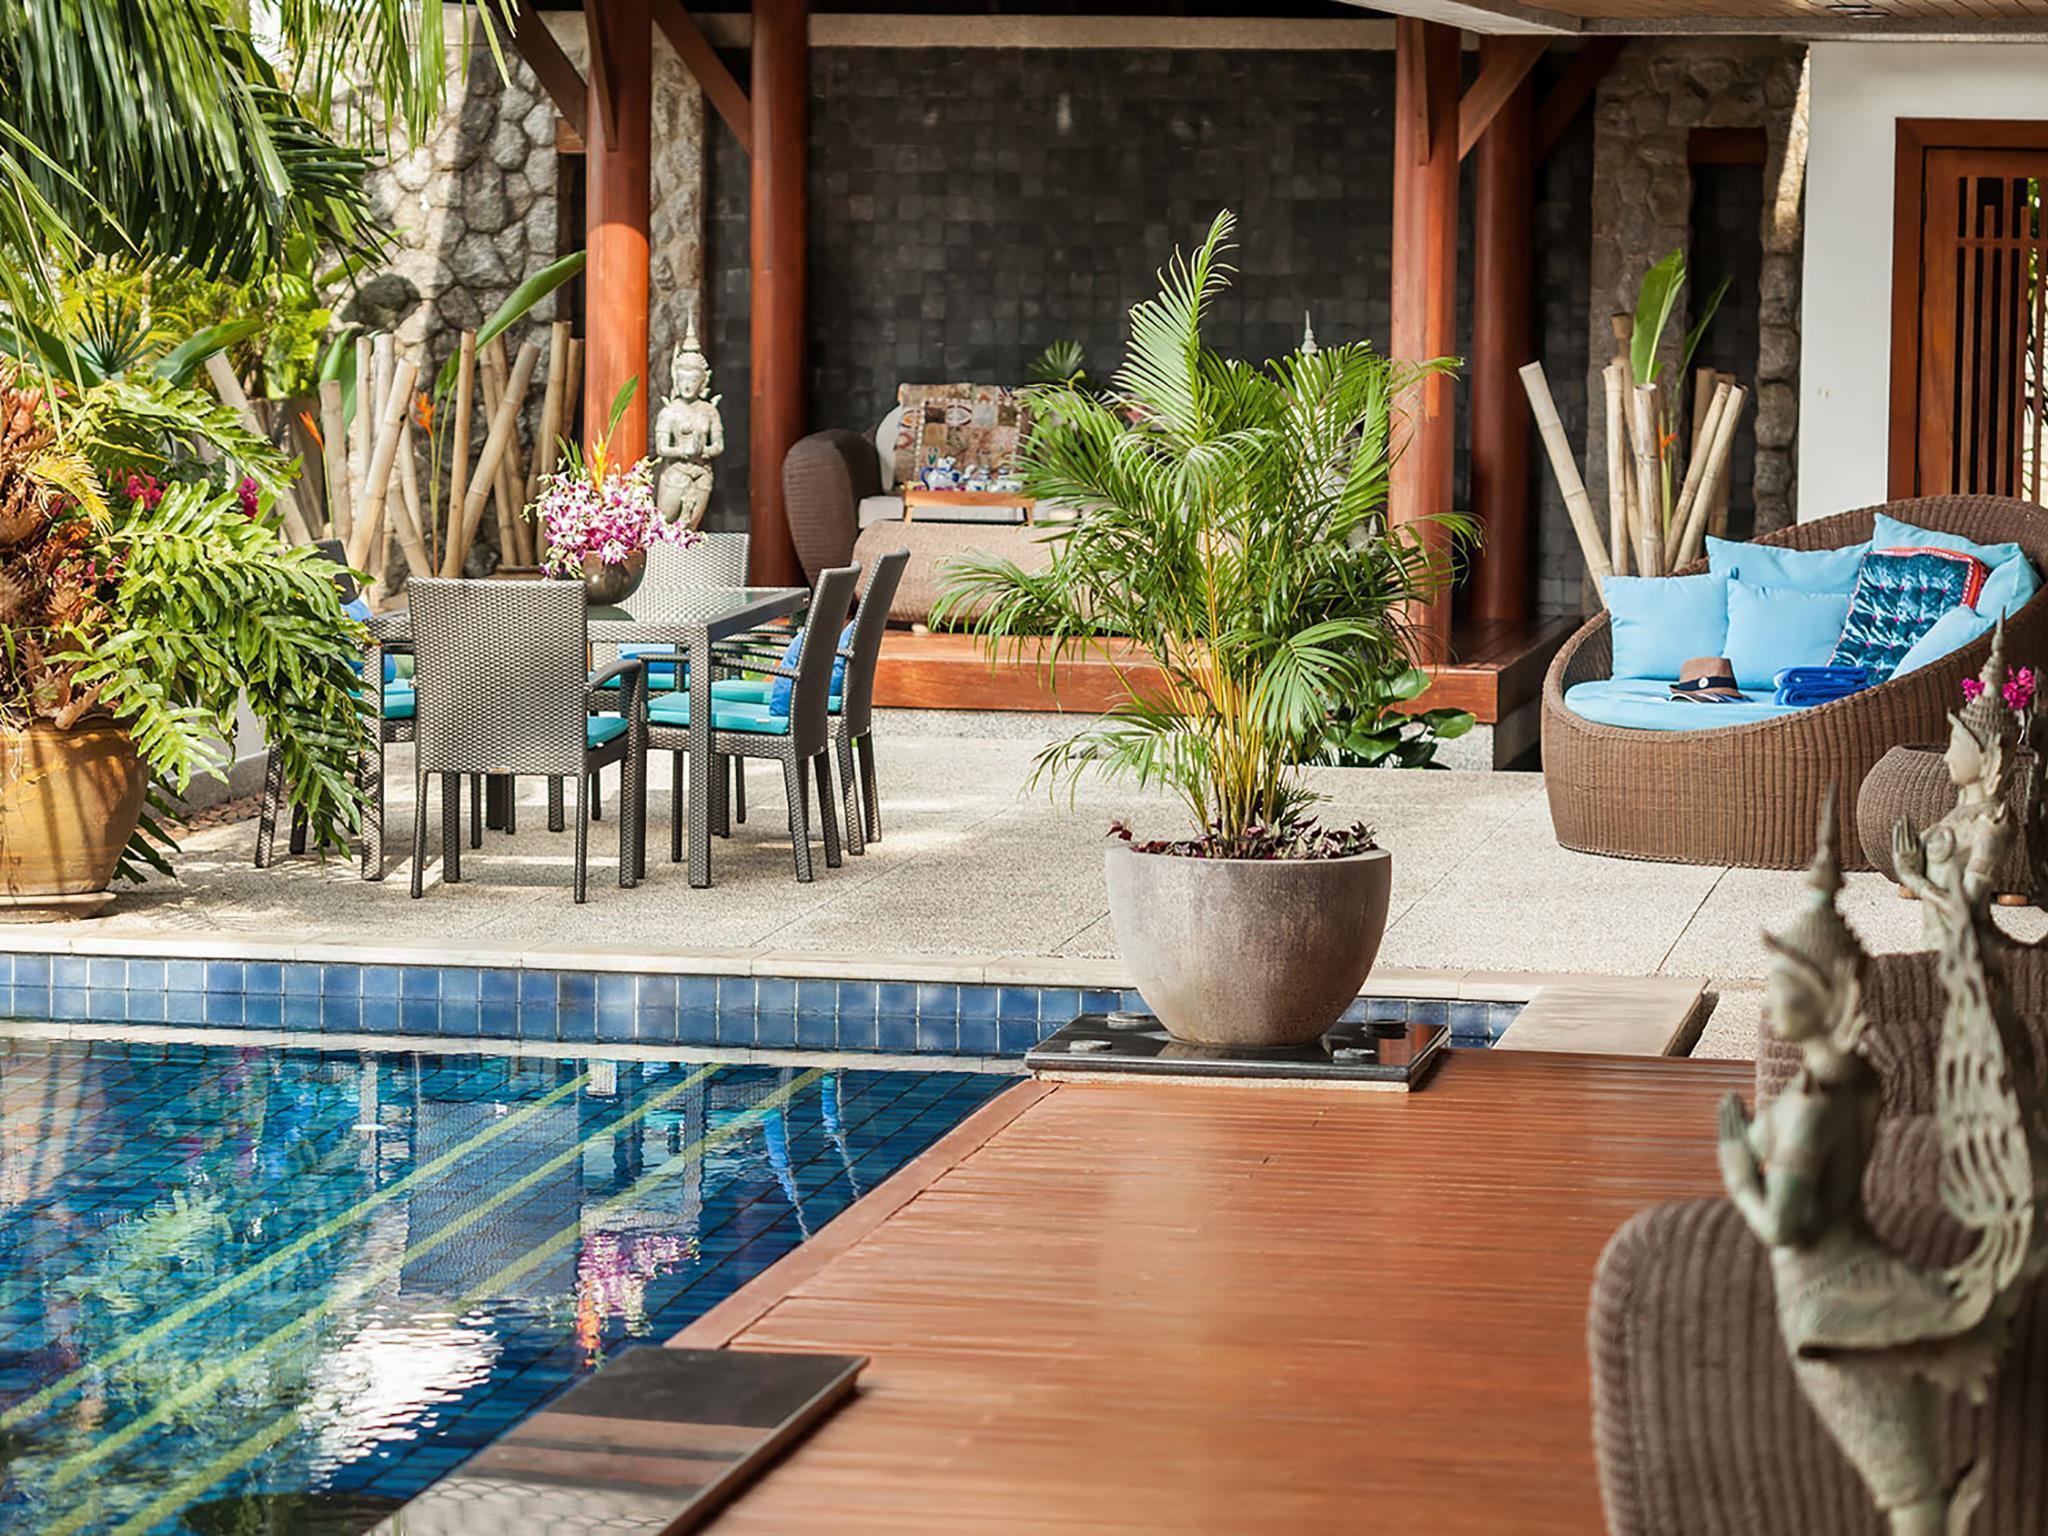 Villa Shambala Phuket - an elite haven วิลลา ชัมบาลา ภูเก็ต - แอน เอลิต เฮเวน